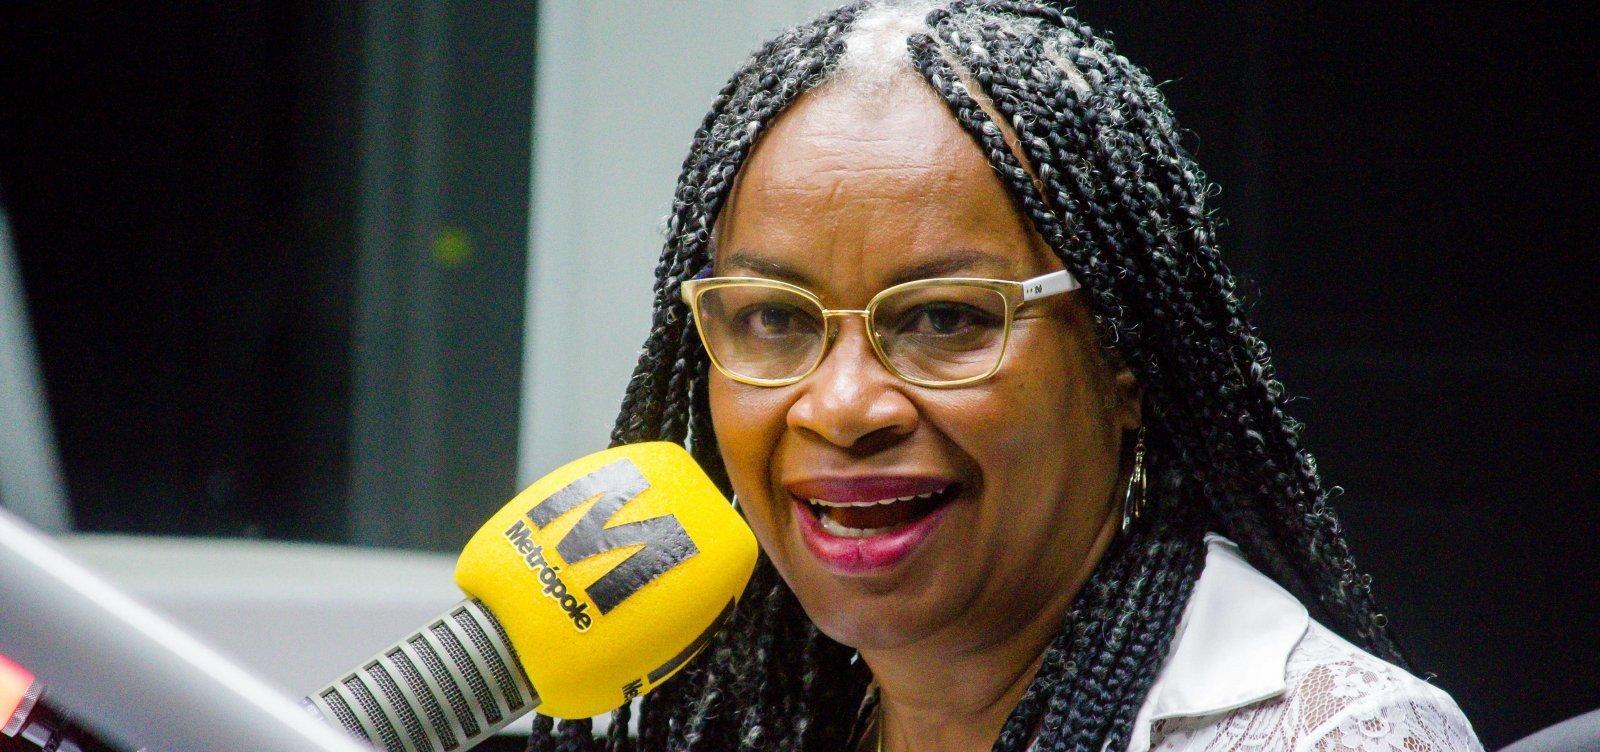 Caso Marcell Moraes: Olívia Santana levará supostas agressões para presidência da AL-BA